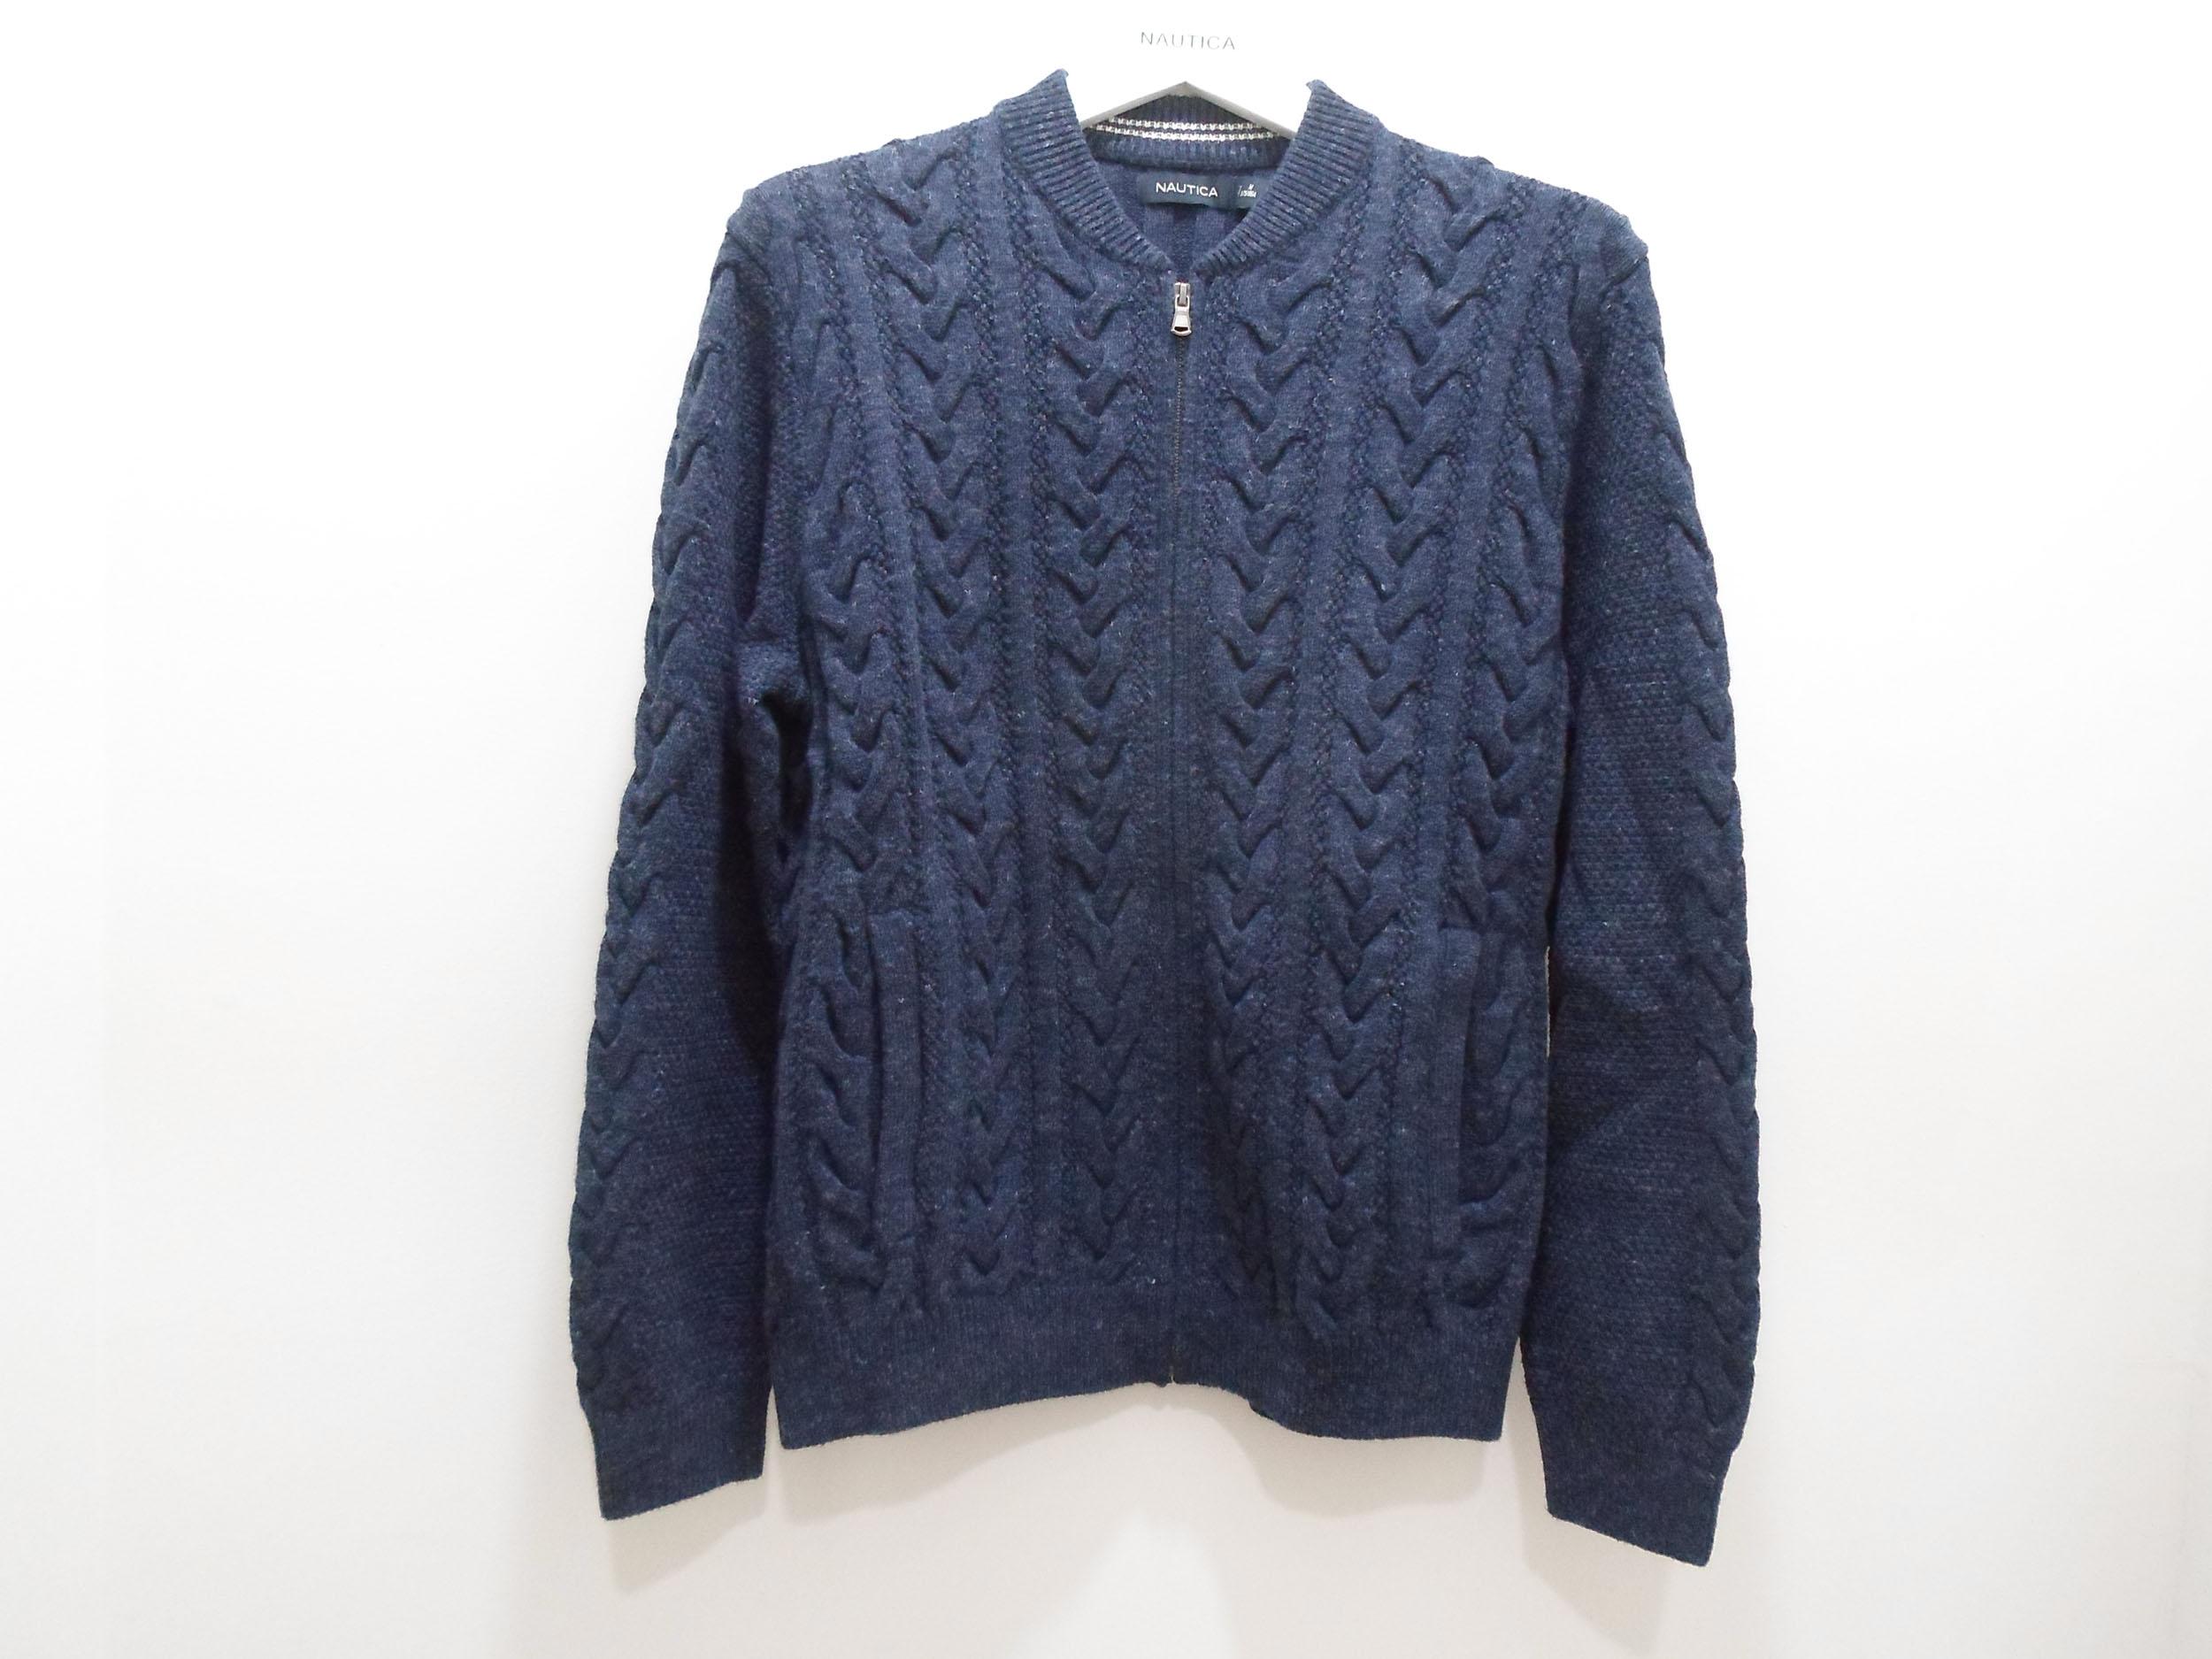 Nautica nodica na0024654cn mens casual T-shirt sweater cardigan jacket